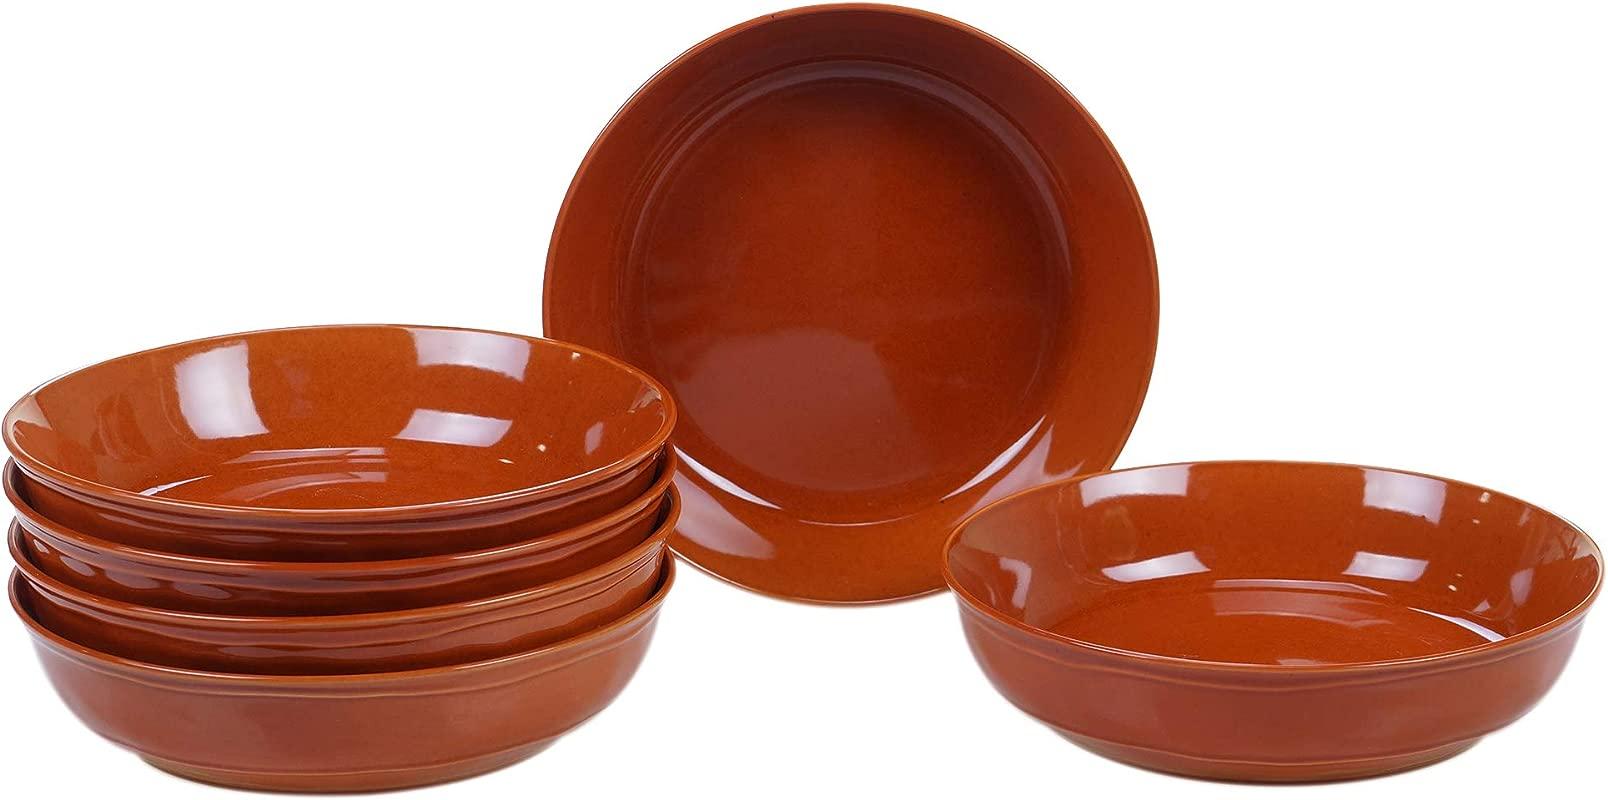 Certified International 22764SET6 Autumn Fields Orbit Pumpkin 8 5 Soup Pasta Bowl Set Of 6 One Size Mulicolored